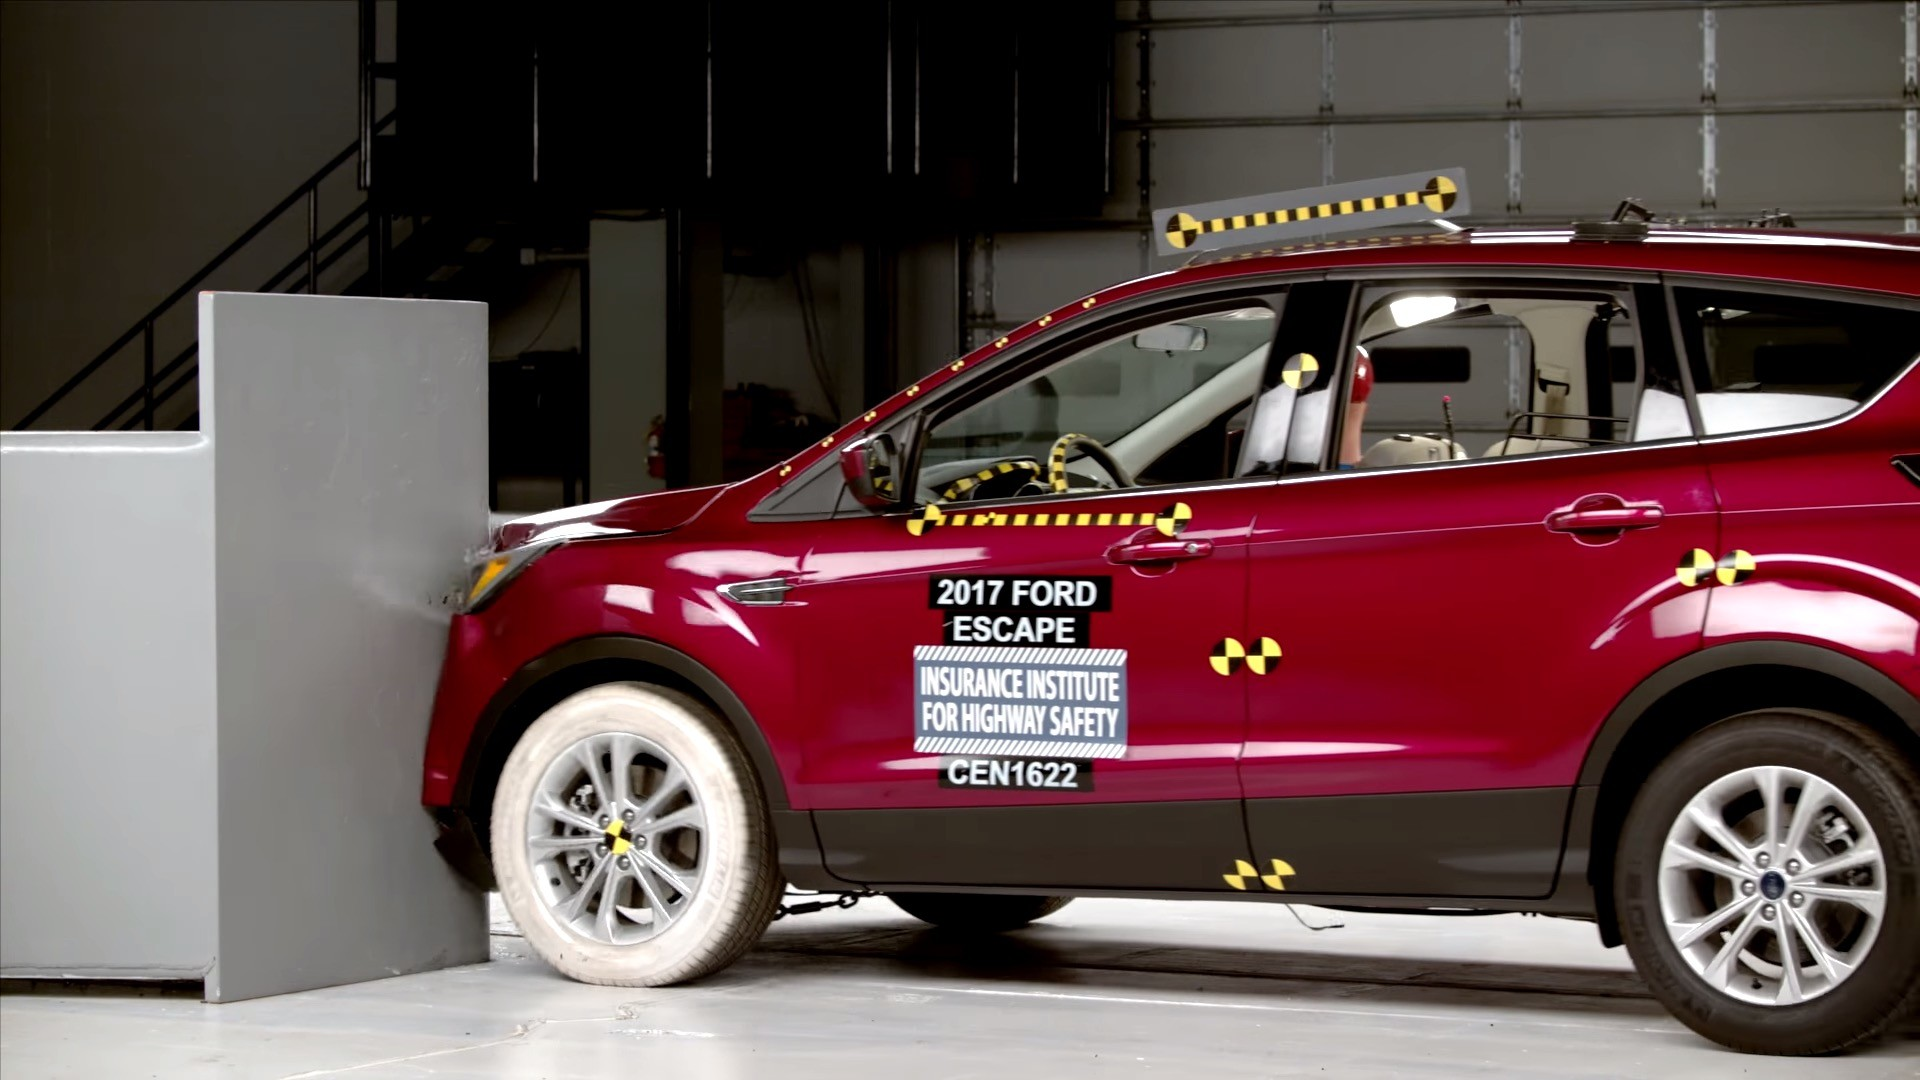 Ford Escape Crash Test